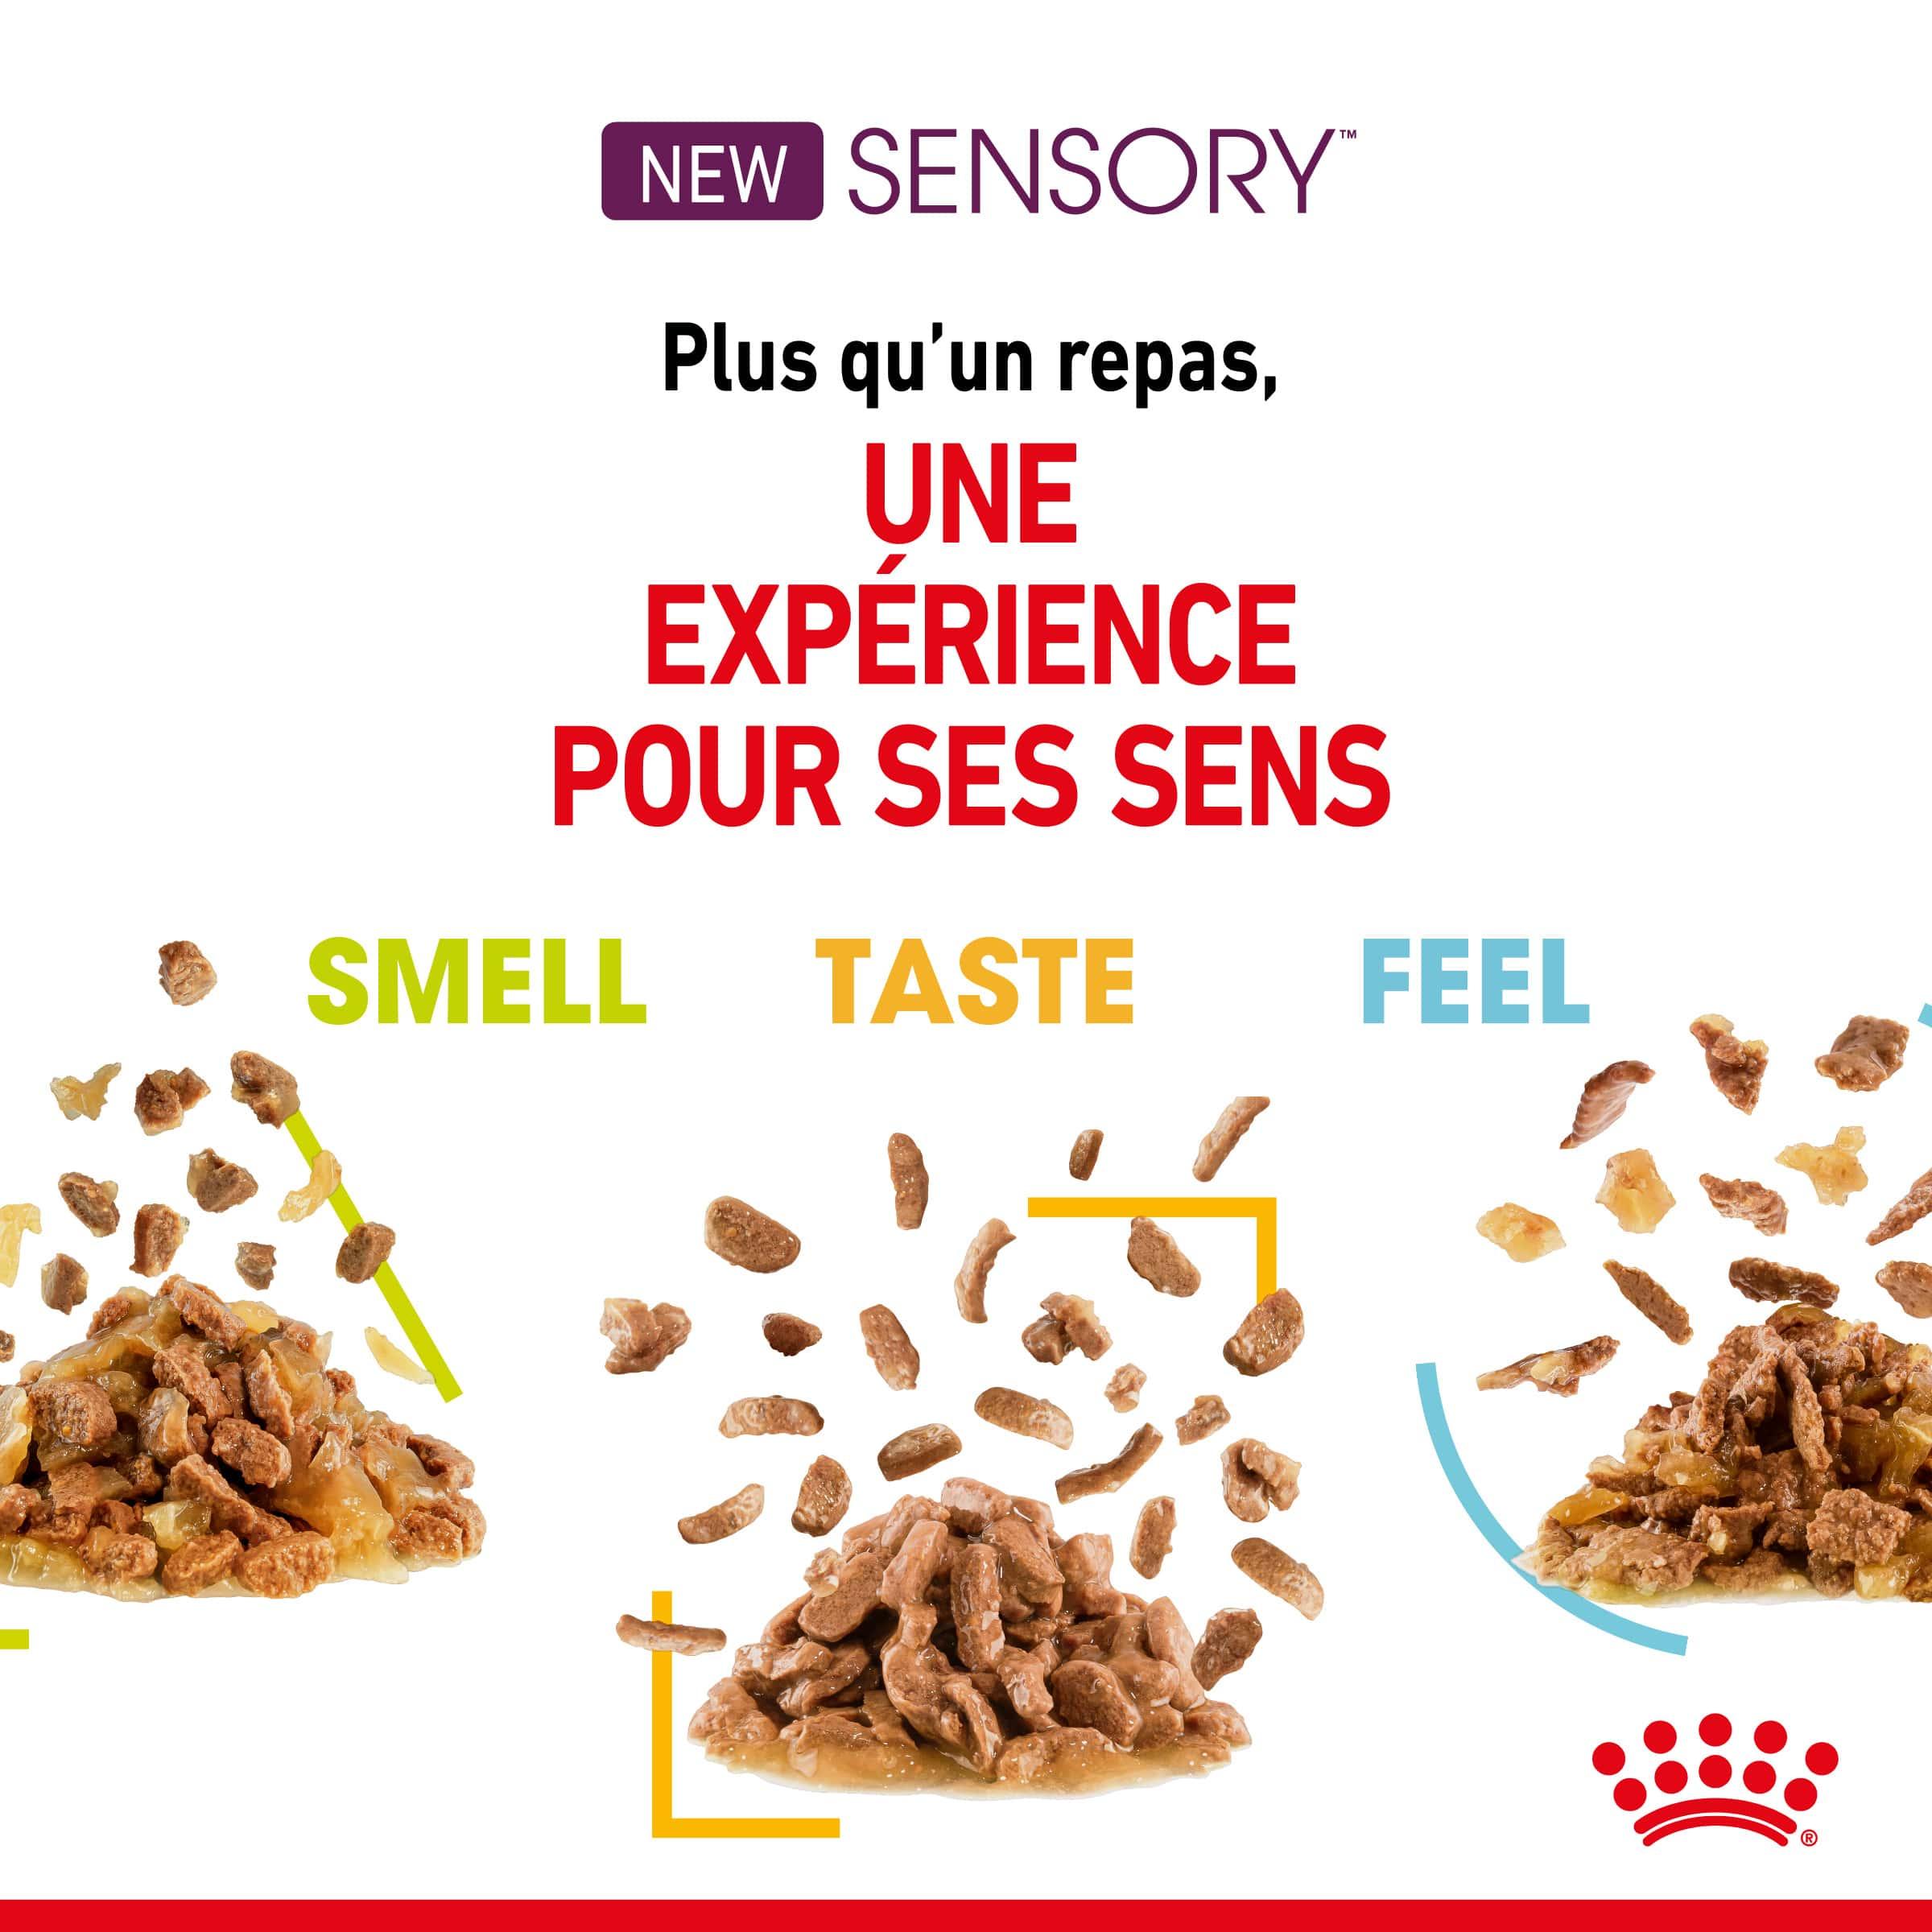 Sensory™ Feel gelée